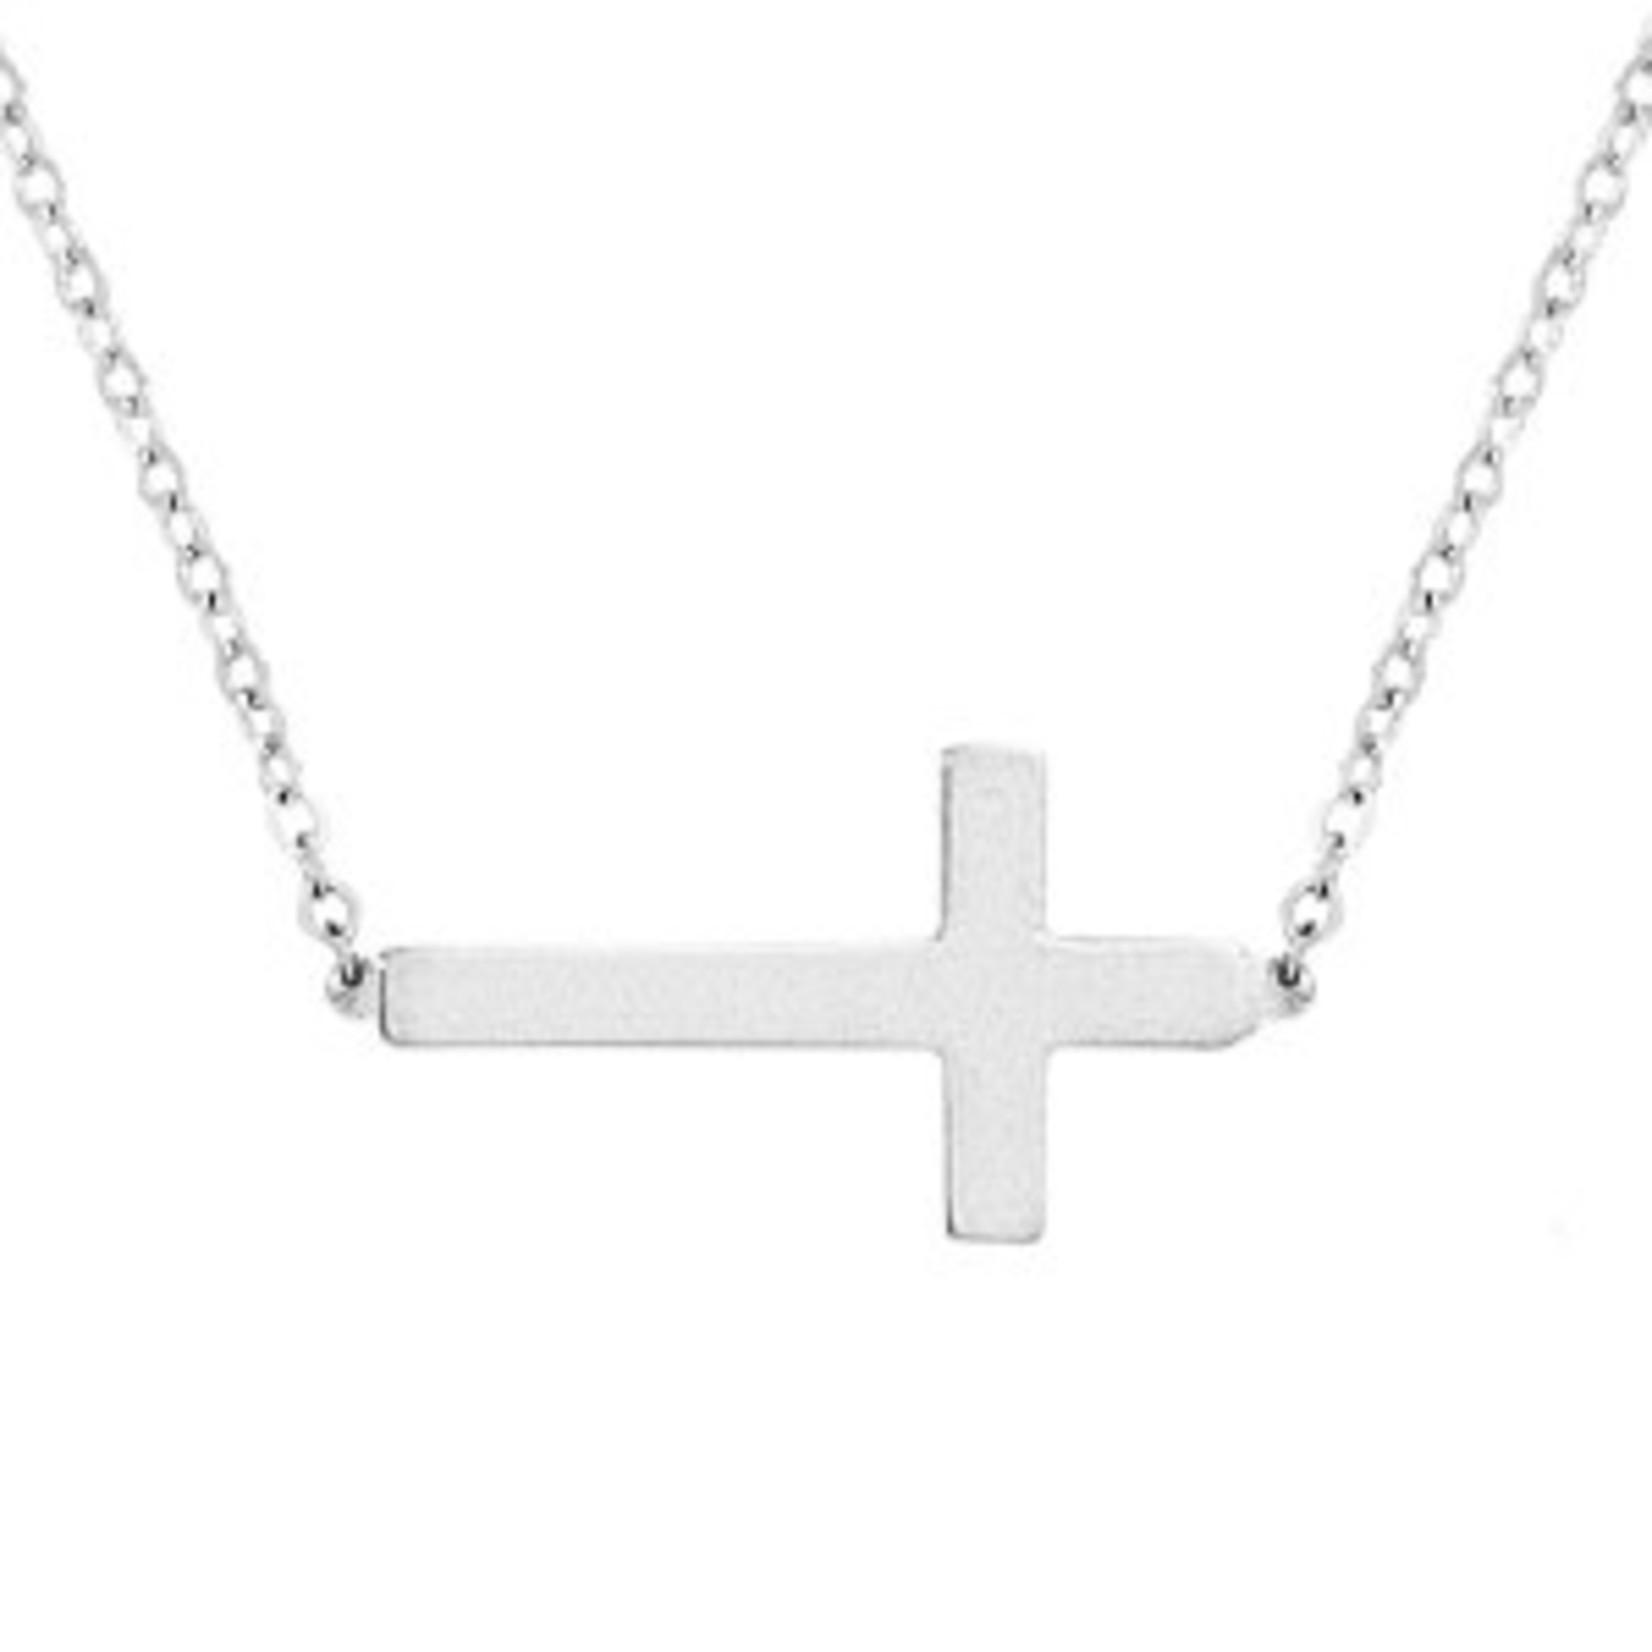 Silver Polished Sideways Cross Chain